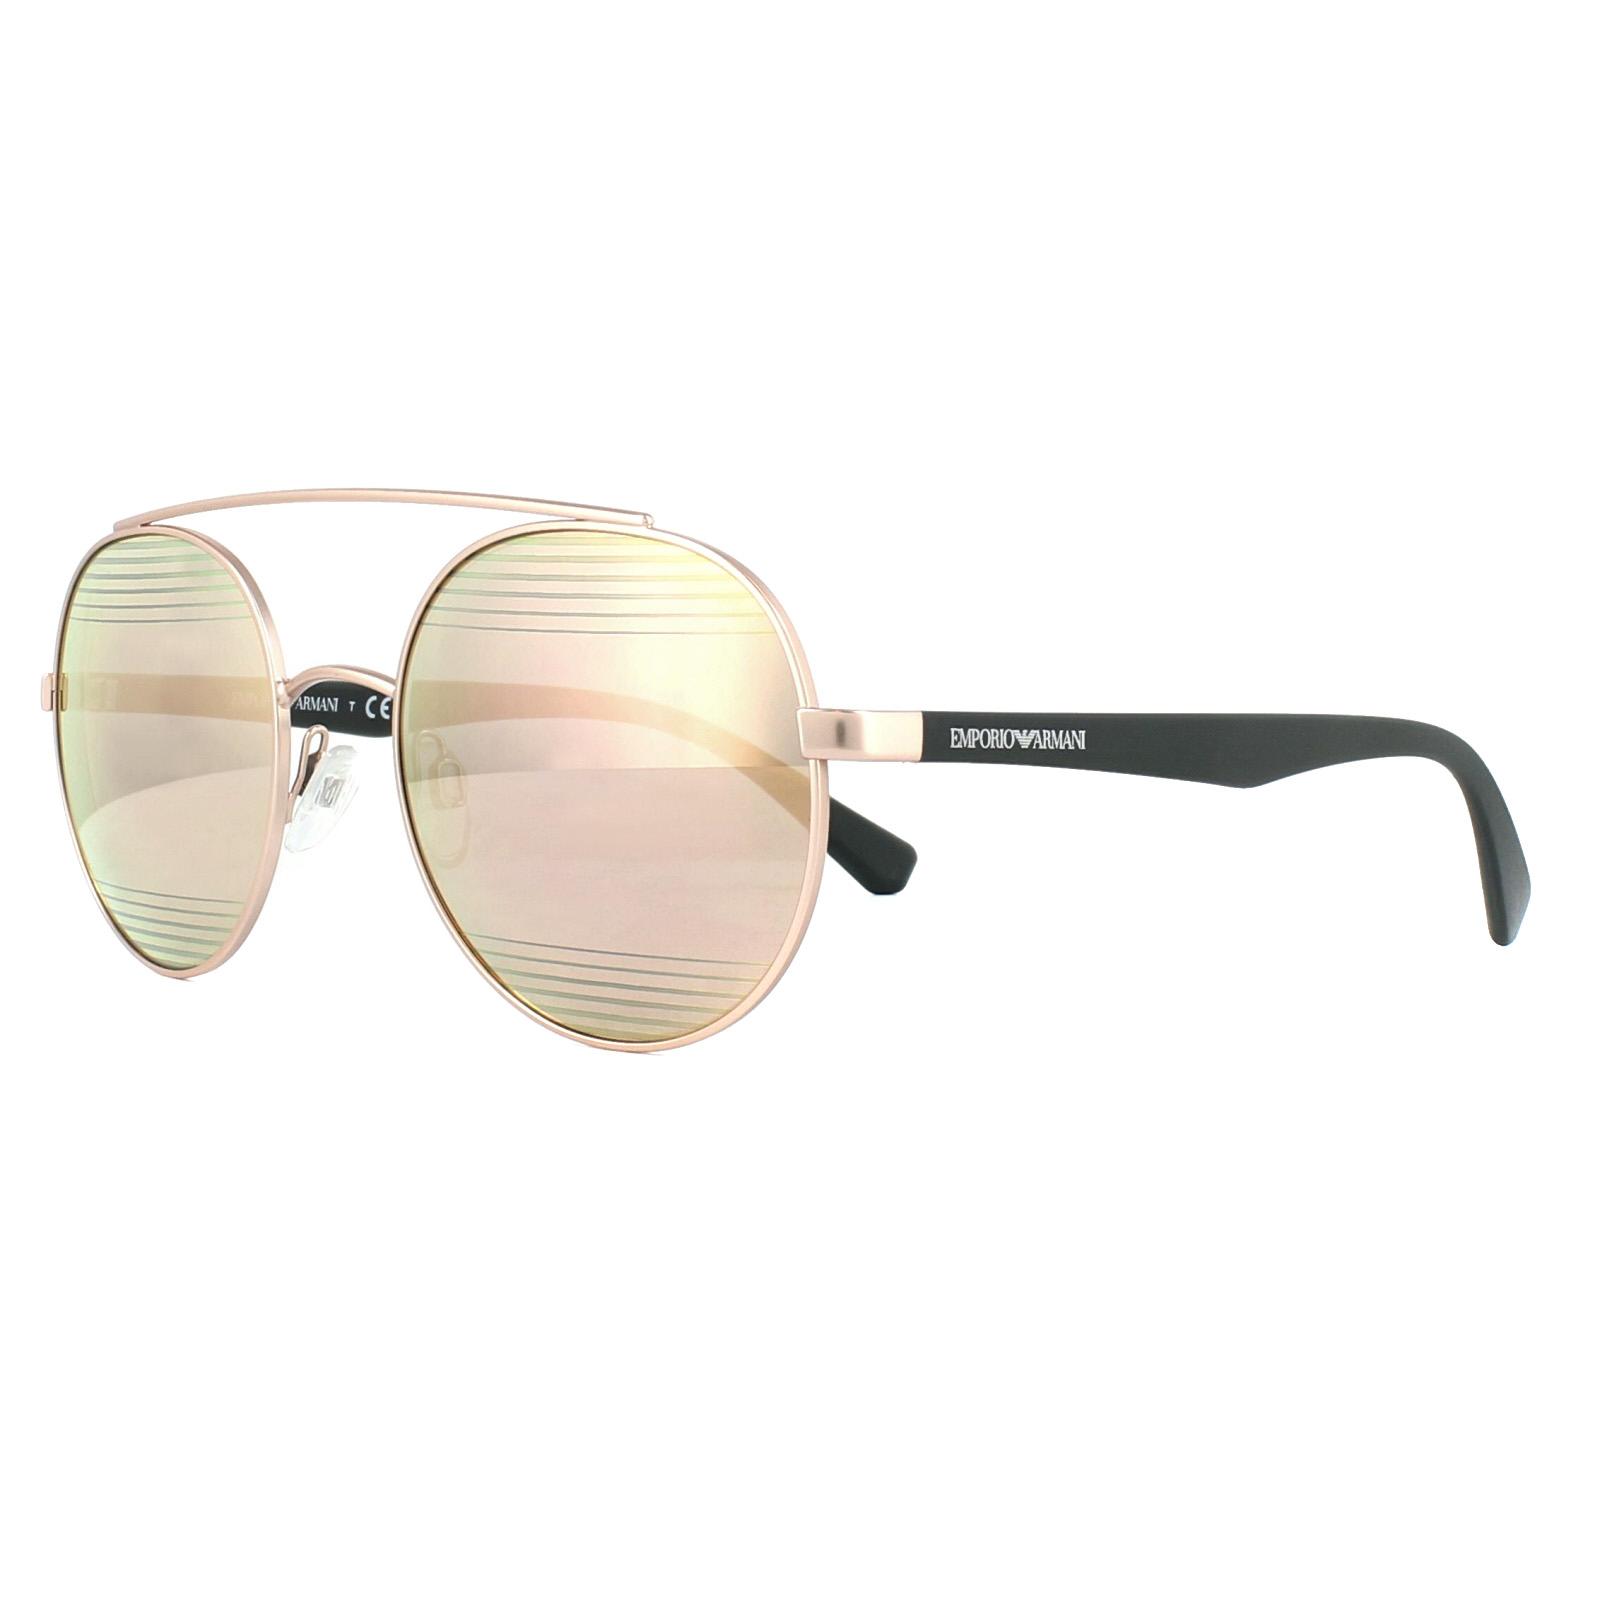 a33a59ed983e Cheap Emporio Armani 2051 Sunglasses - Discounted Sunglasses